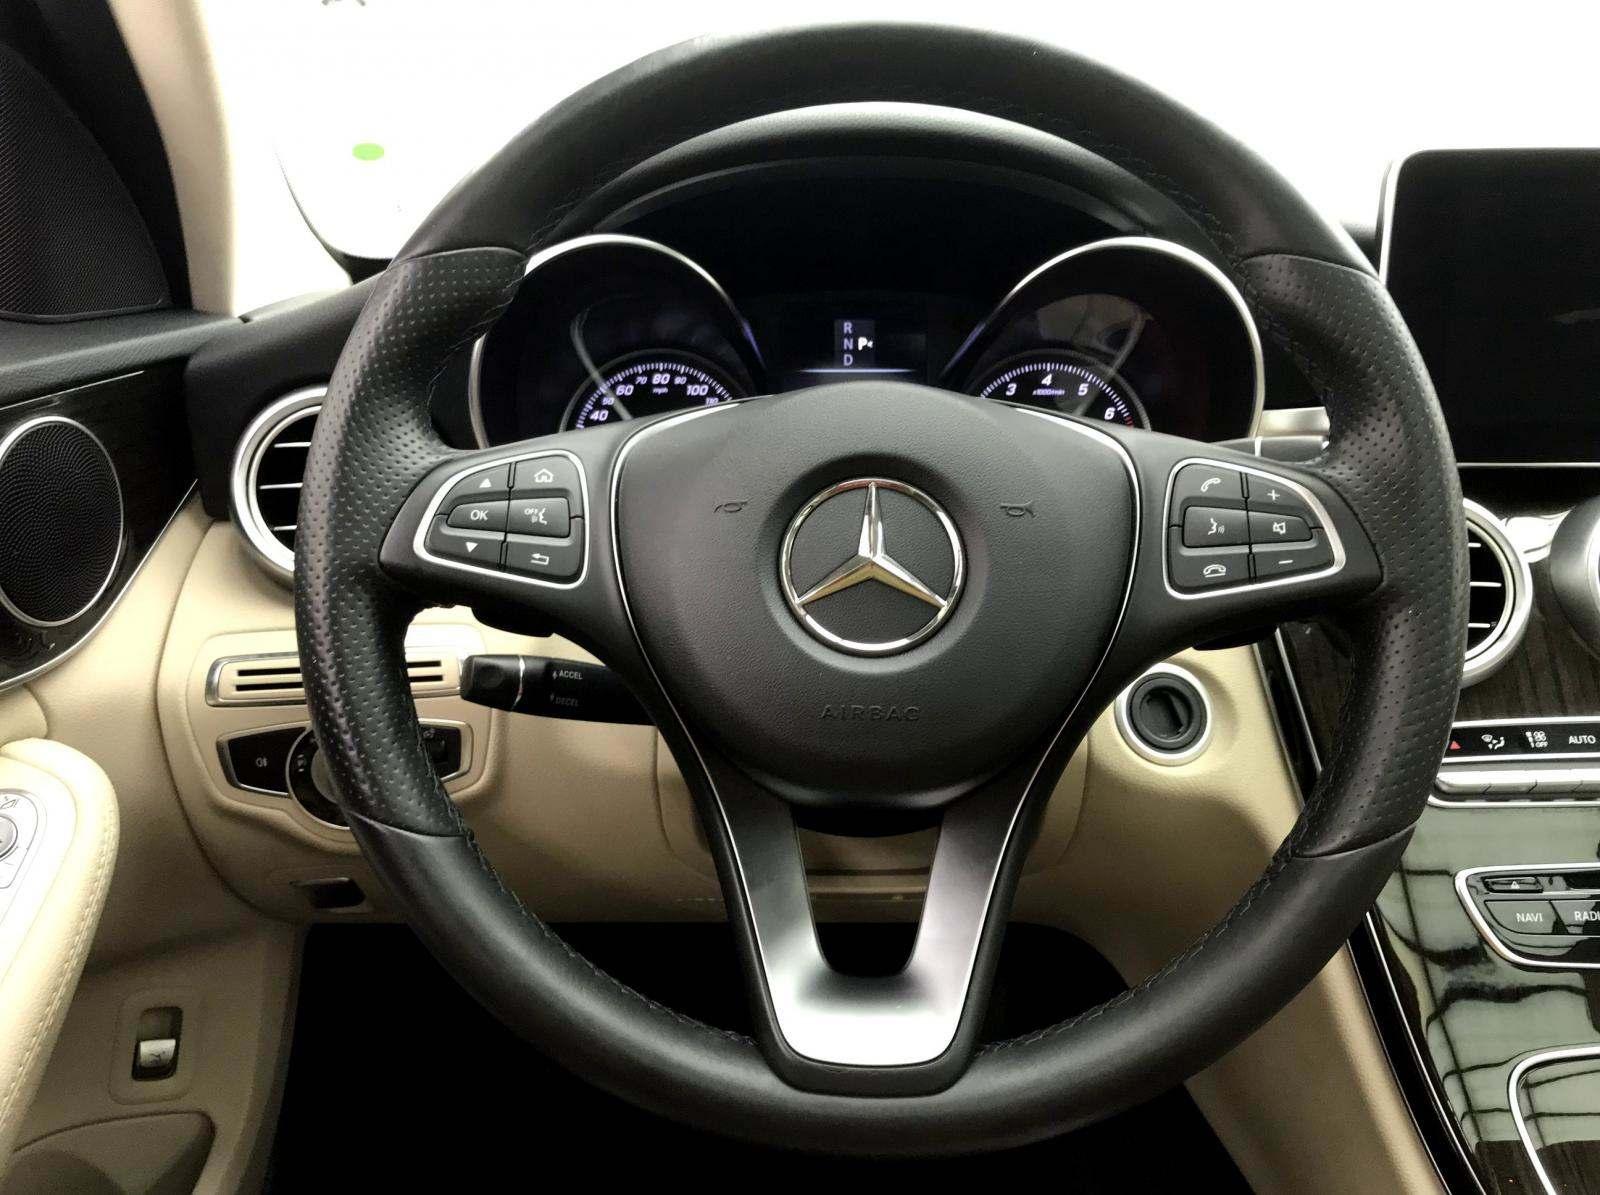 used Mercedes-Benz C-Class 2016 vin: 55SWF4JB8GU161917